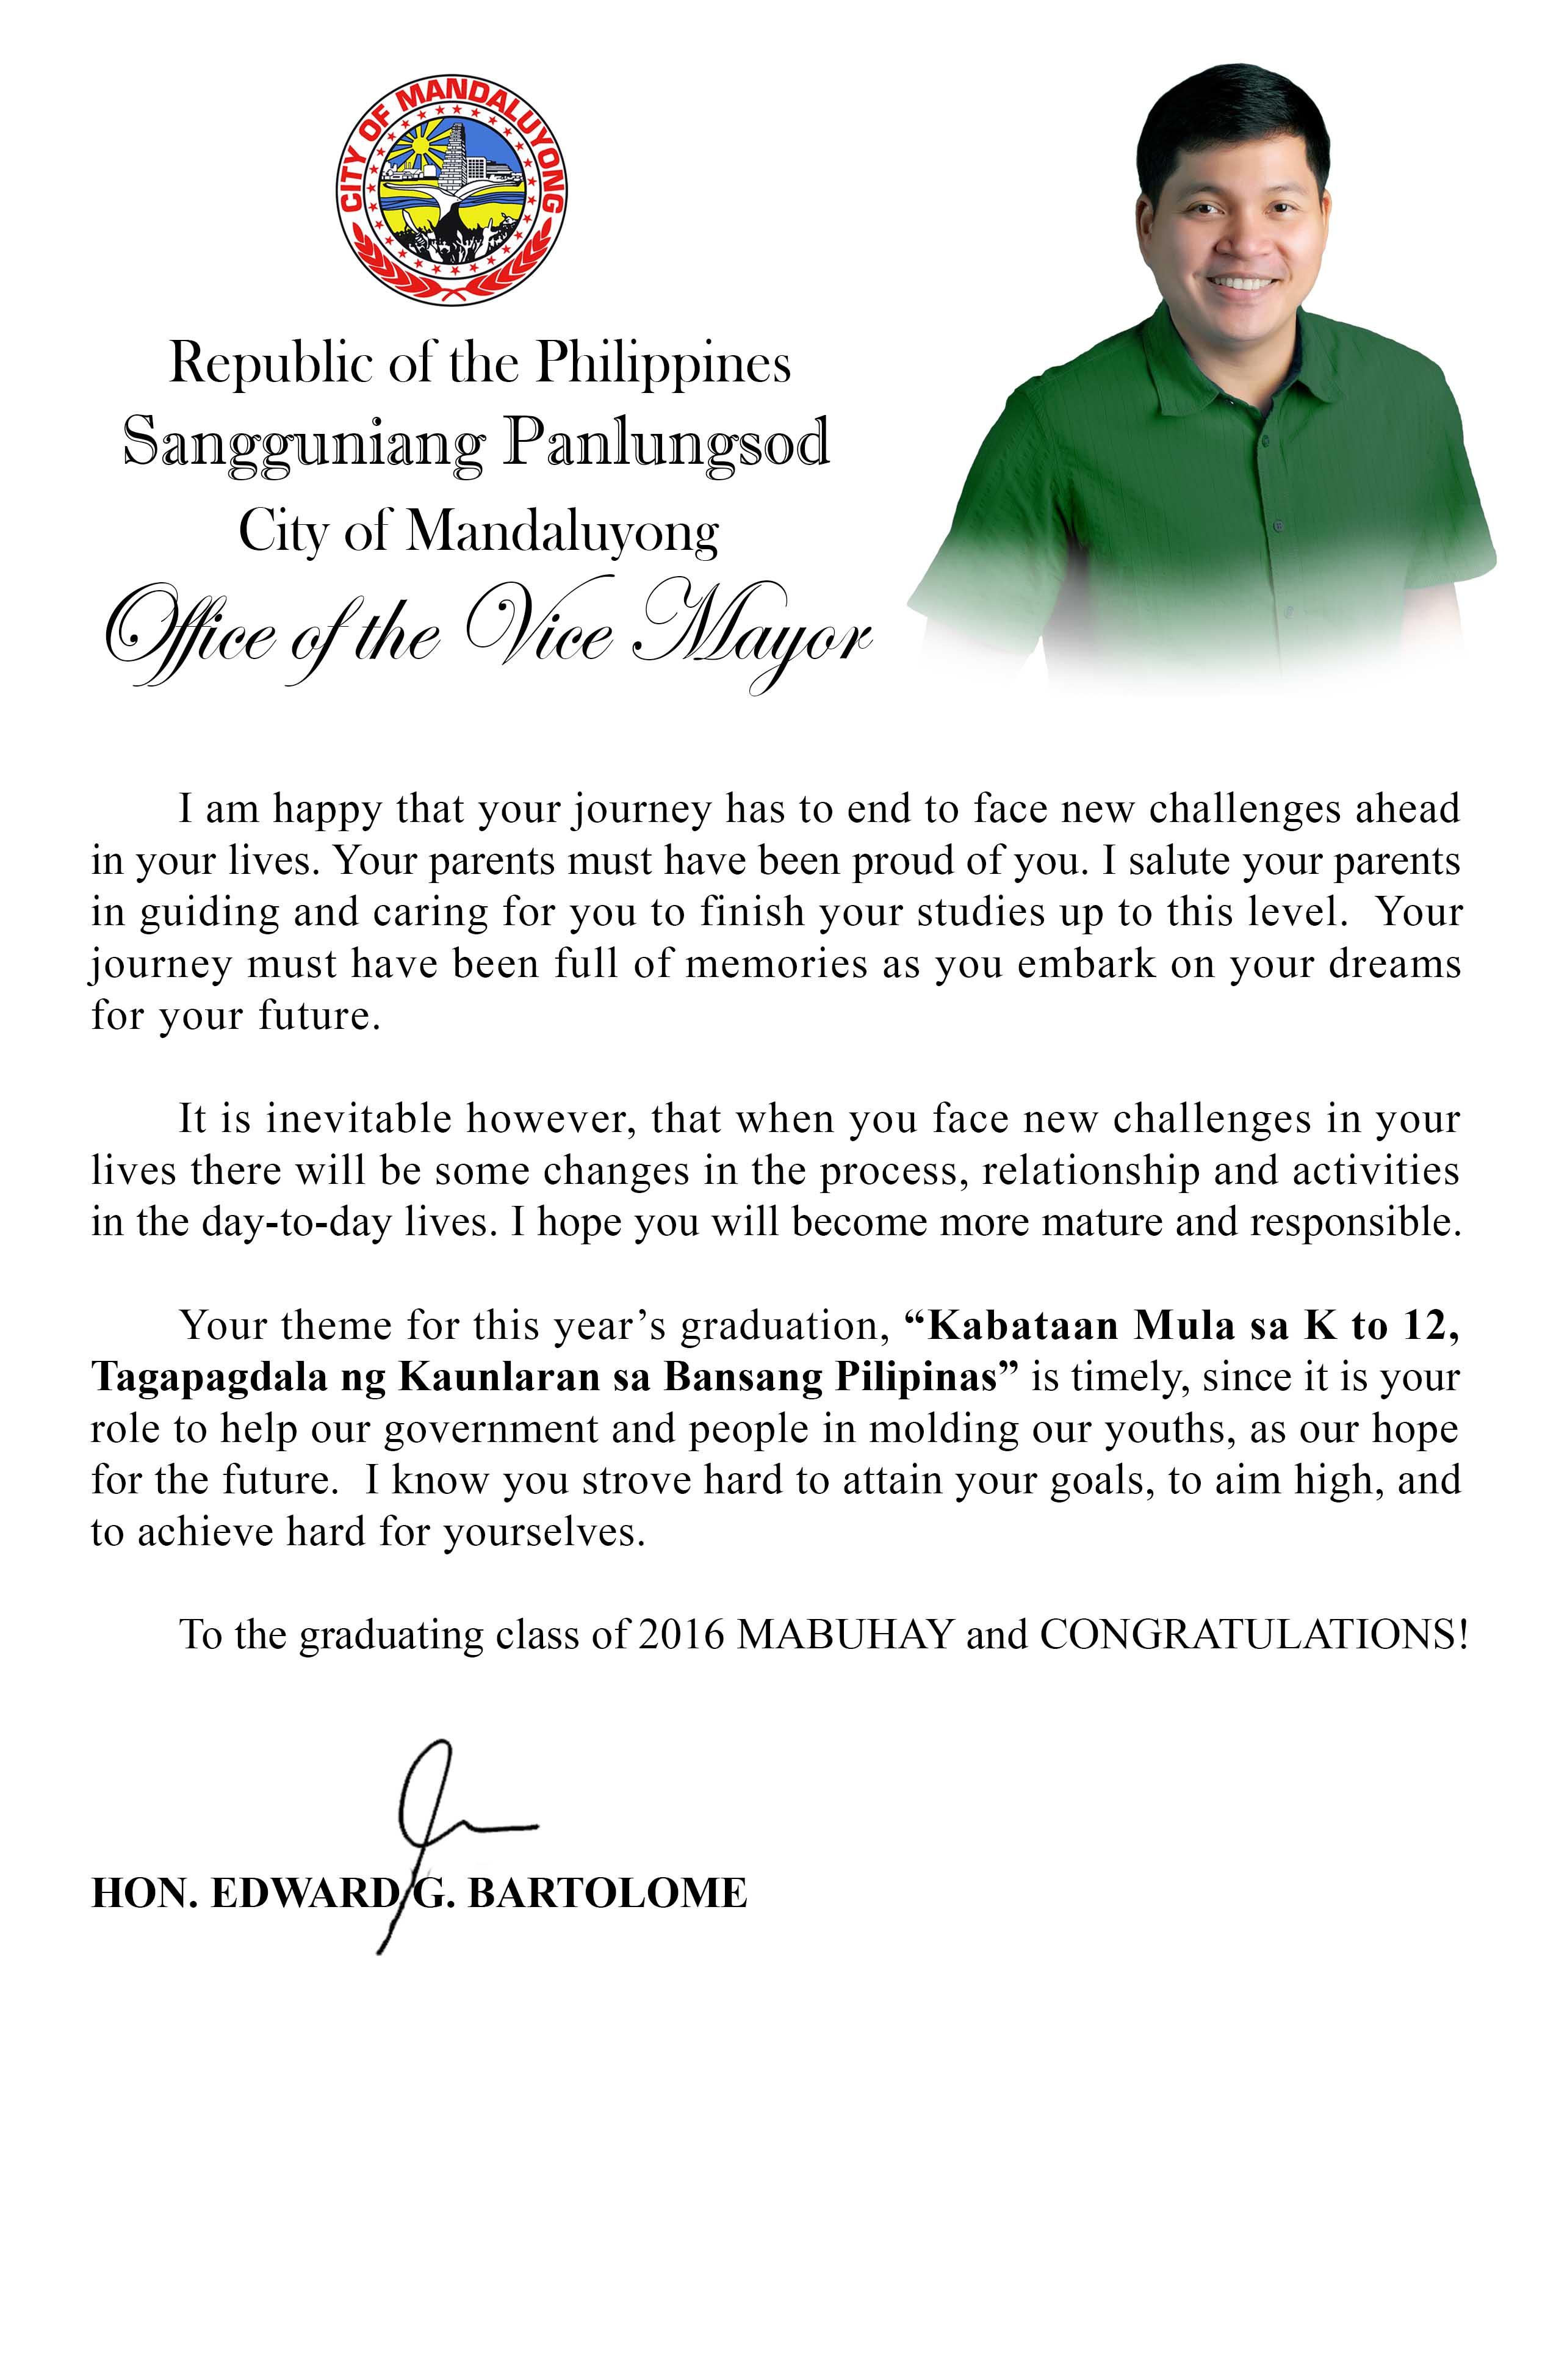 Graduation Message Of Vice Mayor Edward Bartolome Teacherph